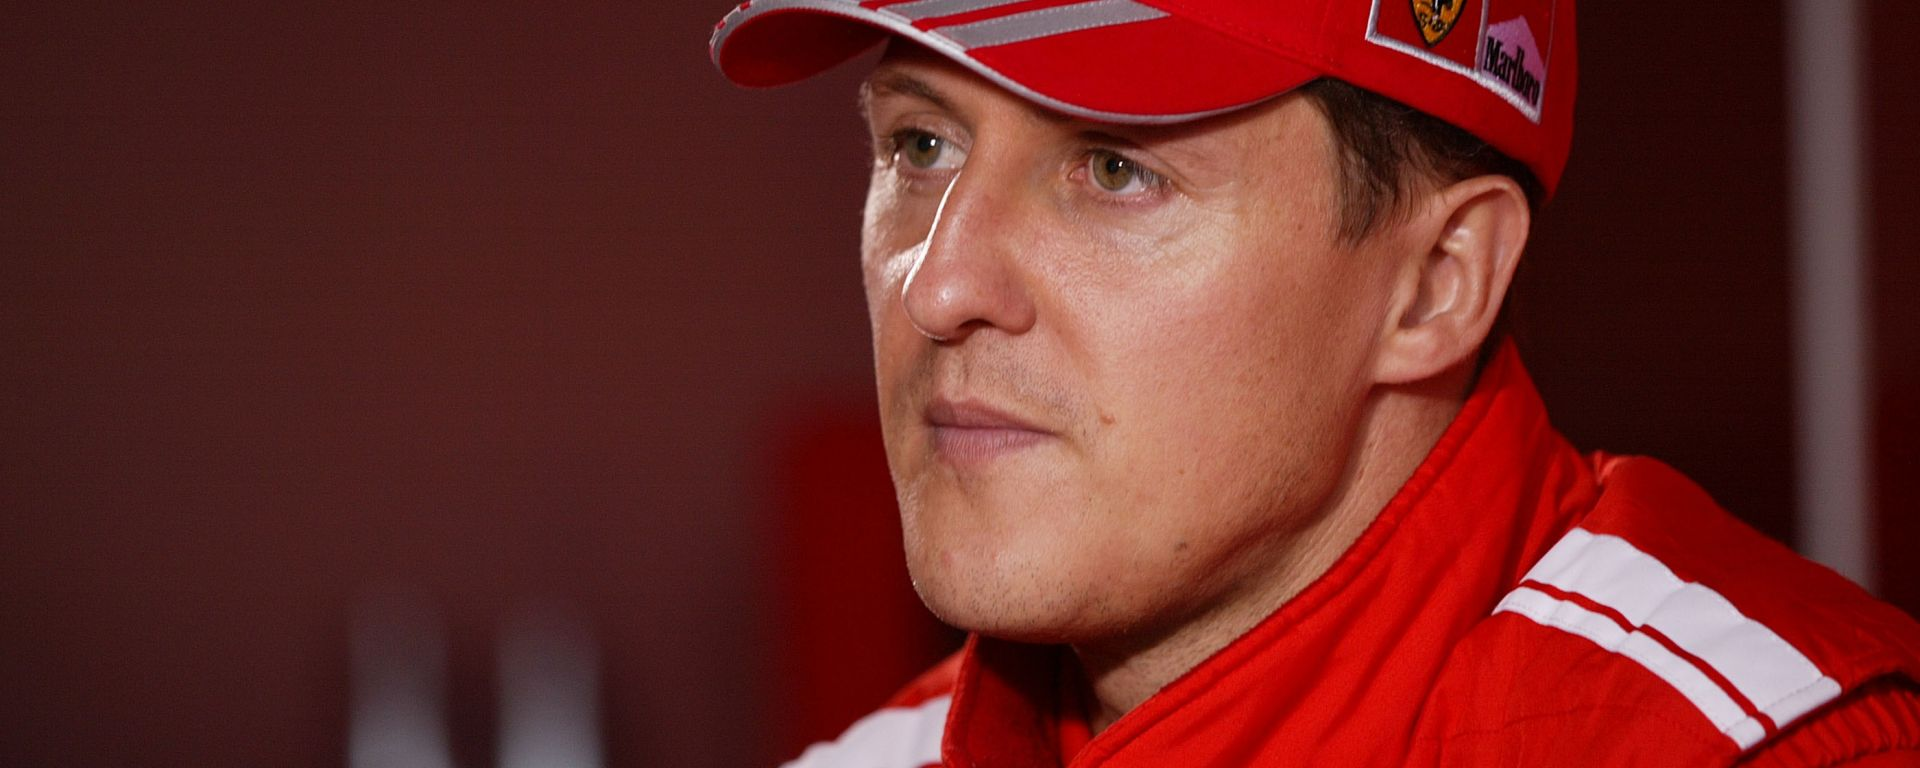 F1 2004: Michael Schumacher (Ferrari)